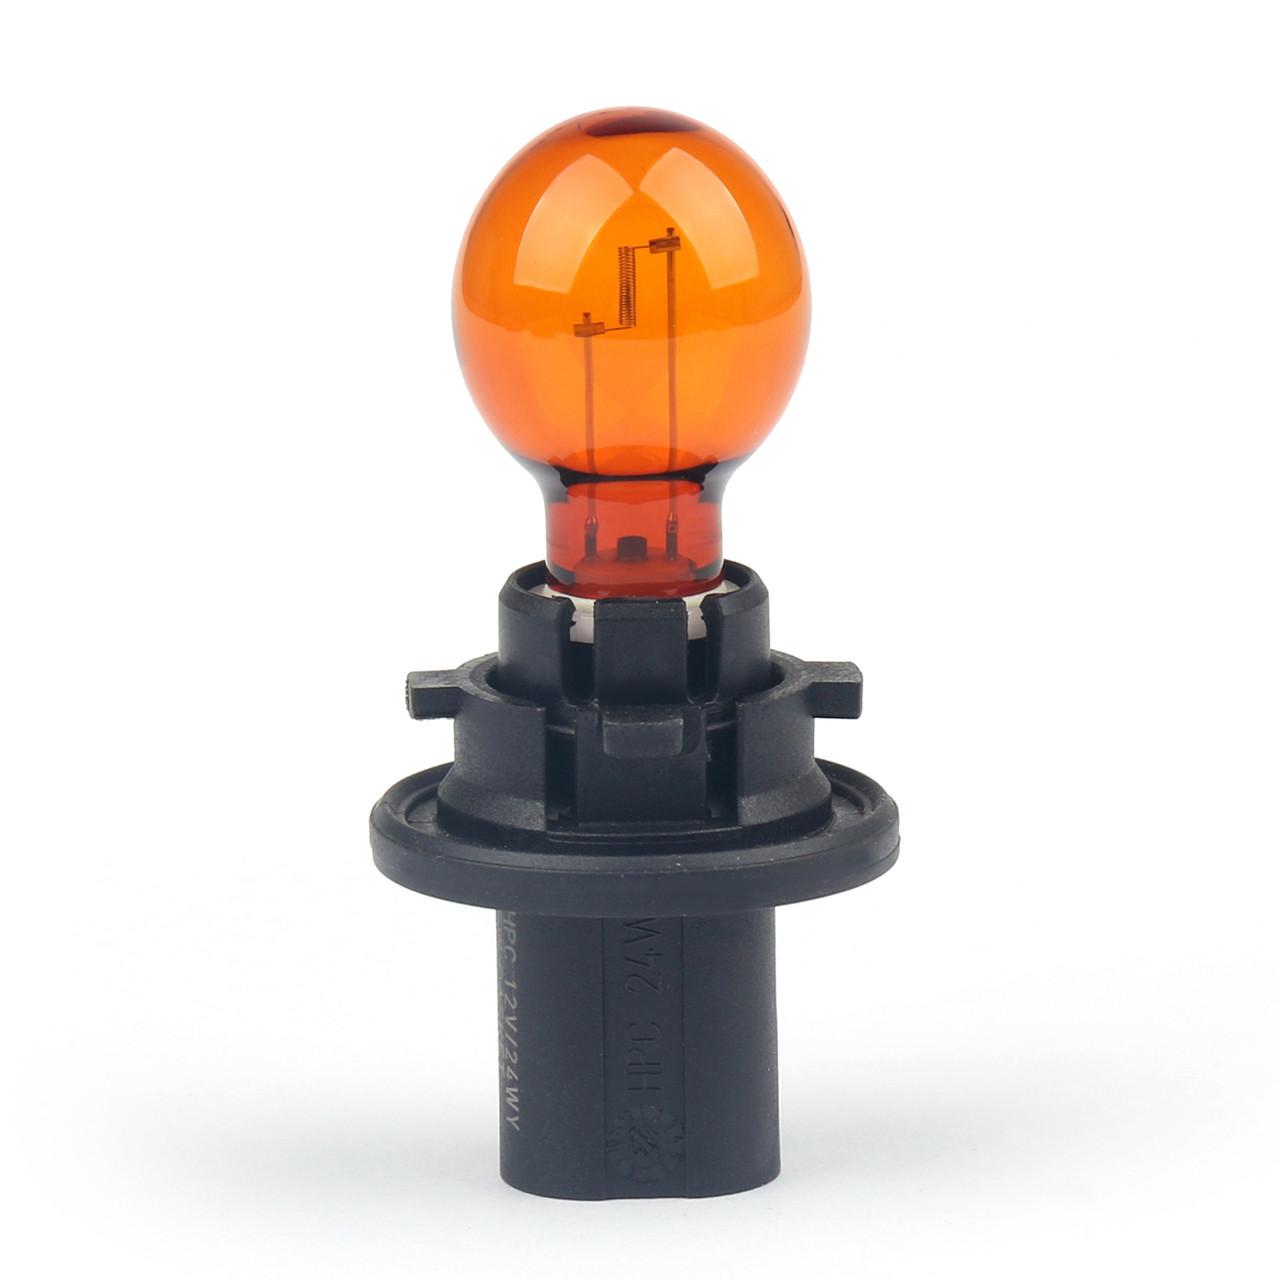 Philips 12272 NA Turn Signal Light Bulbs 24 Watt HPC24WY 12V/24W 2200K Orange